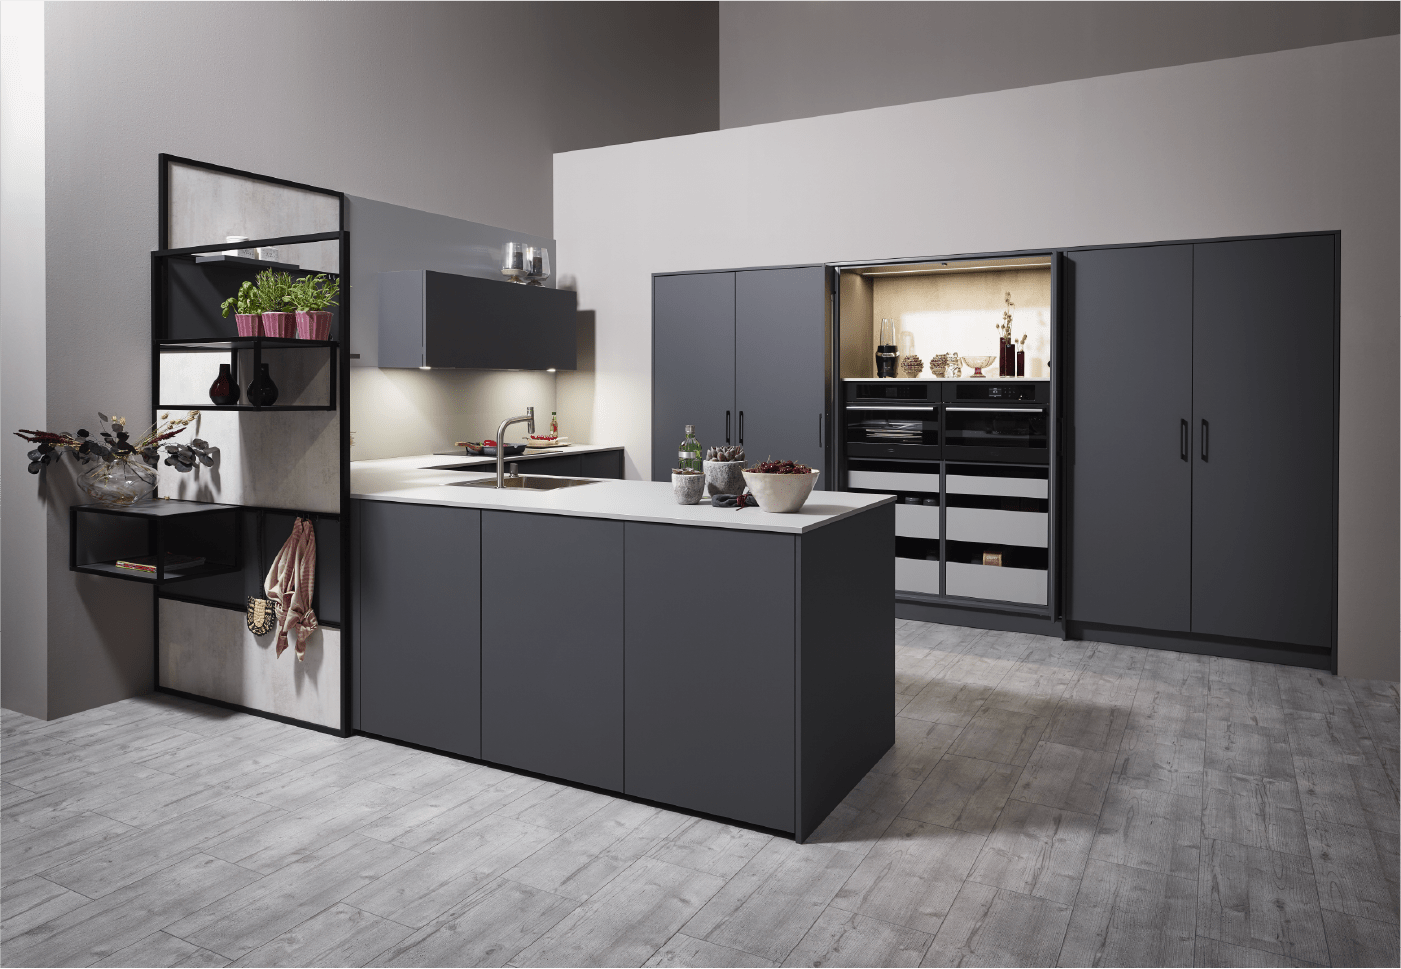 Cabeo-keukens-2-keuken-foto-13